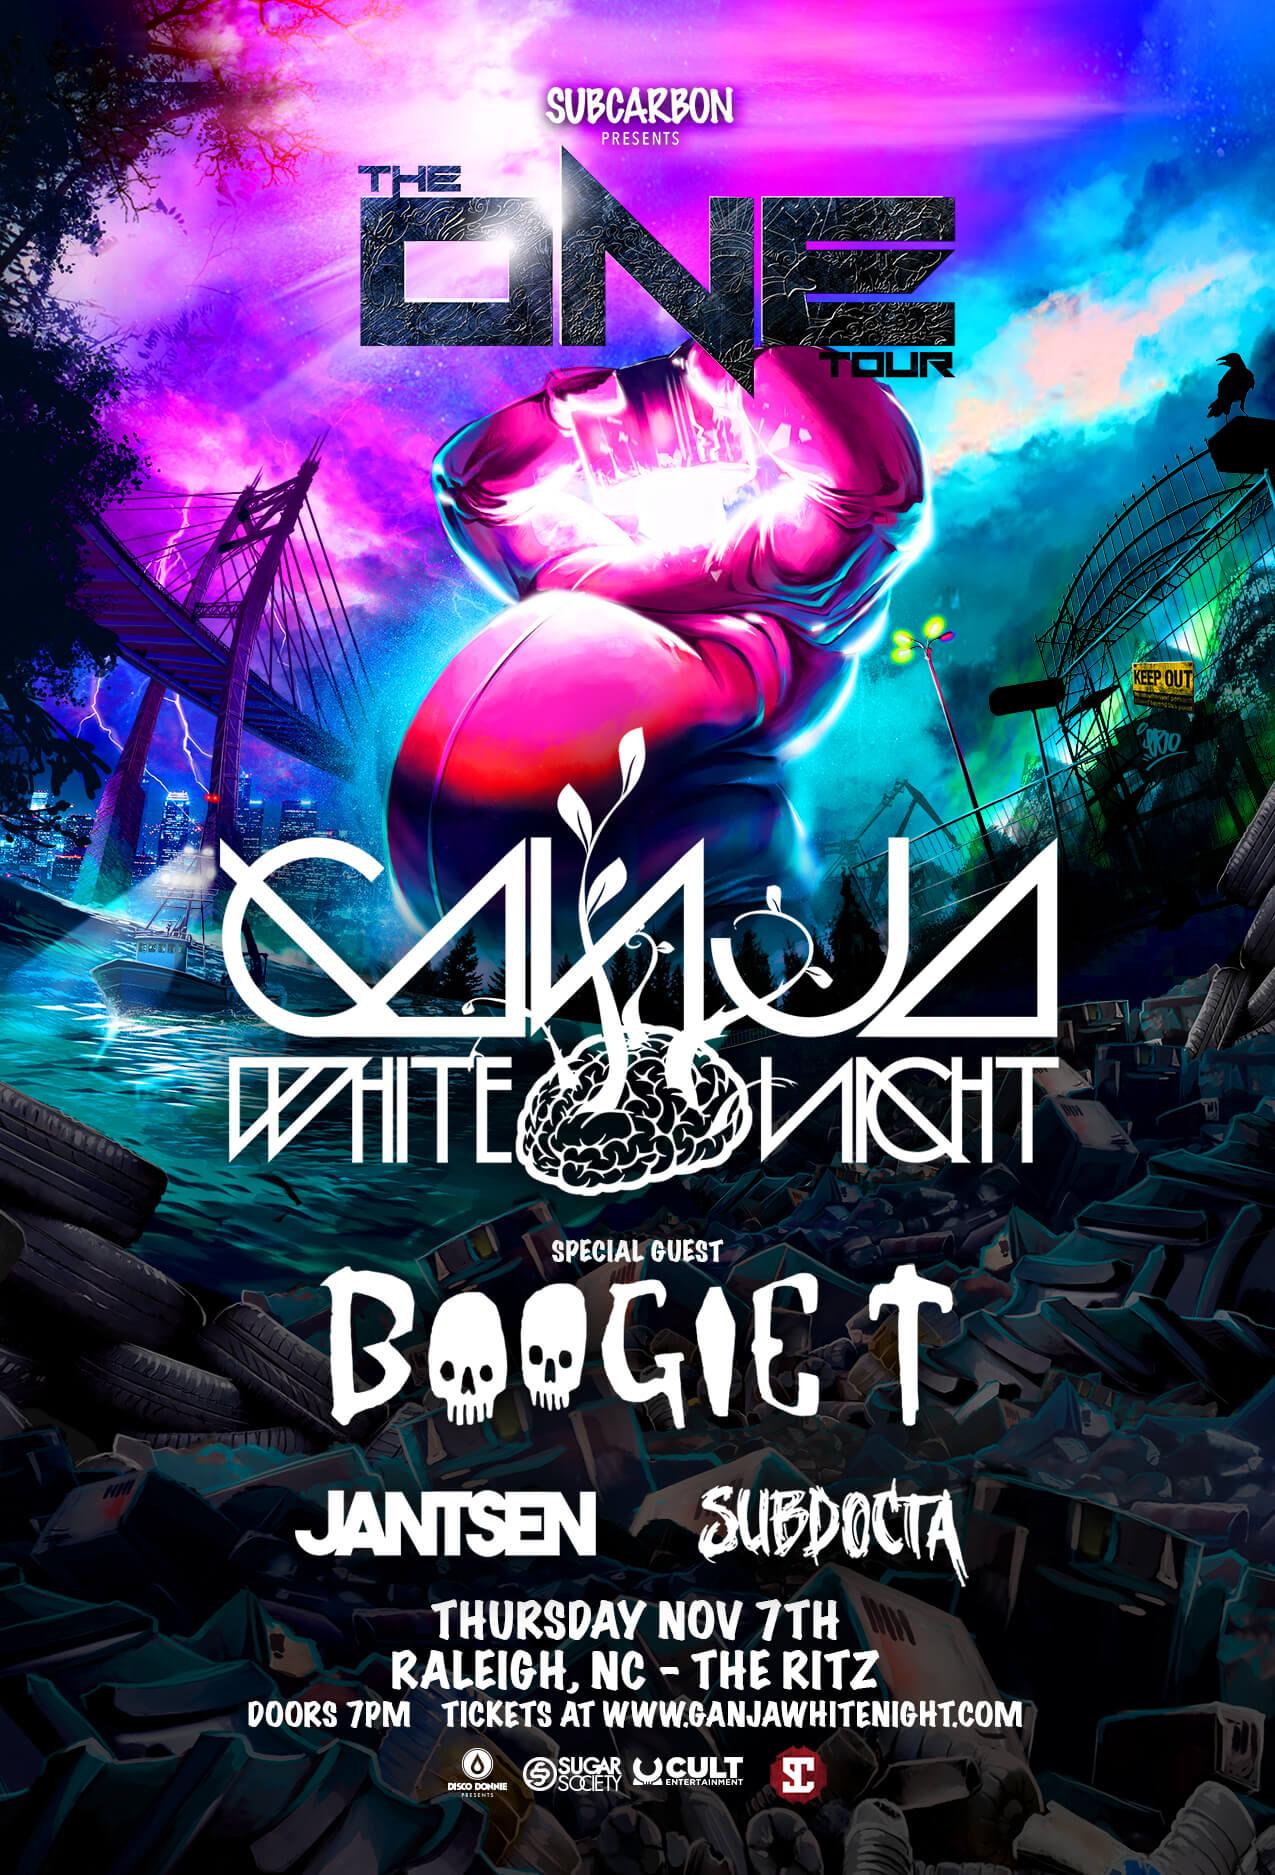 Ganja White Night, Boogie T, Jantsen, SubDocta in Raleigh